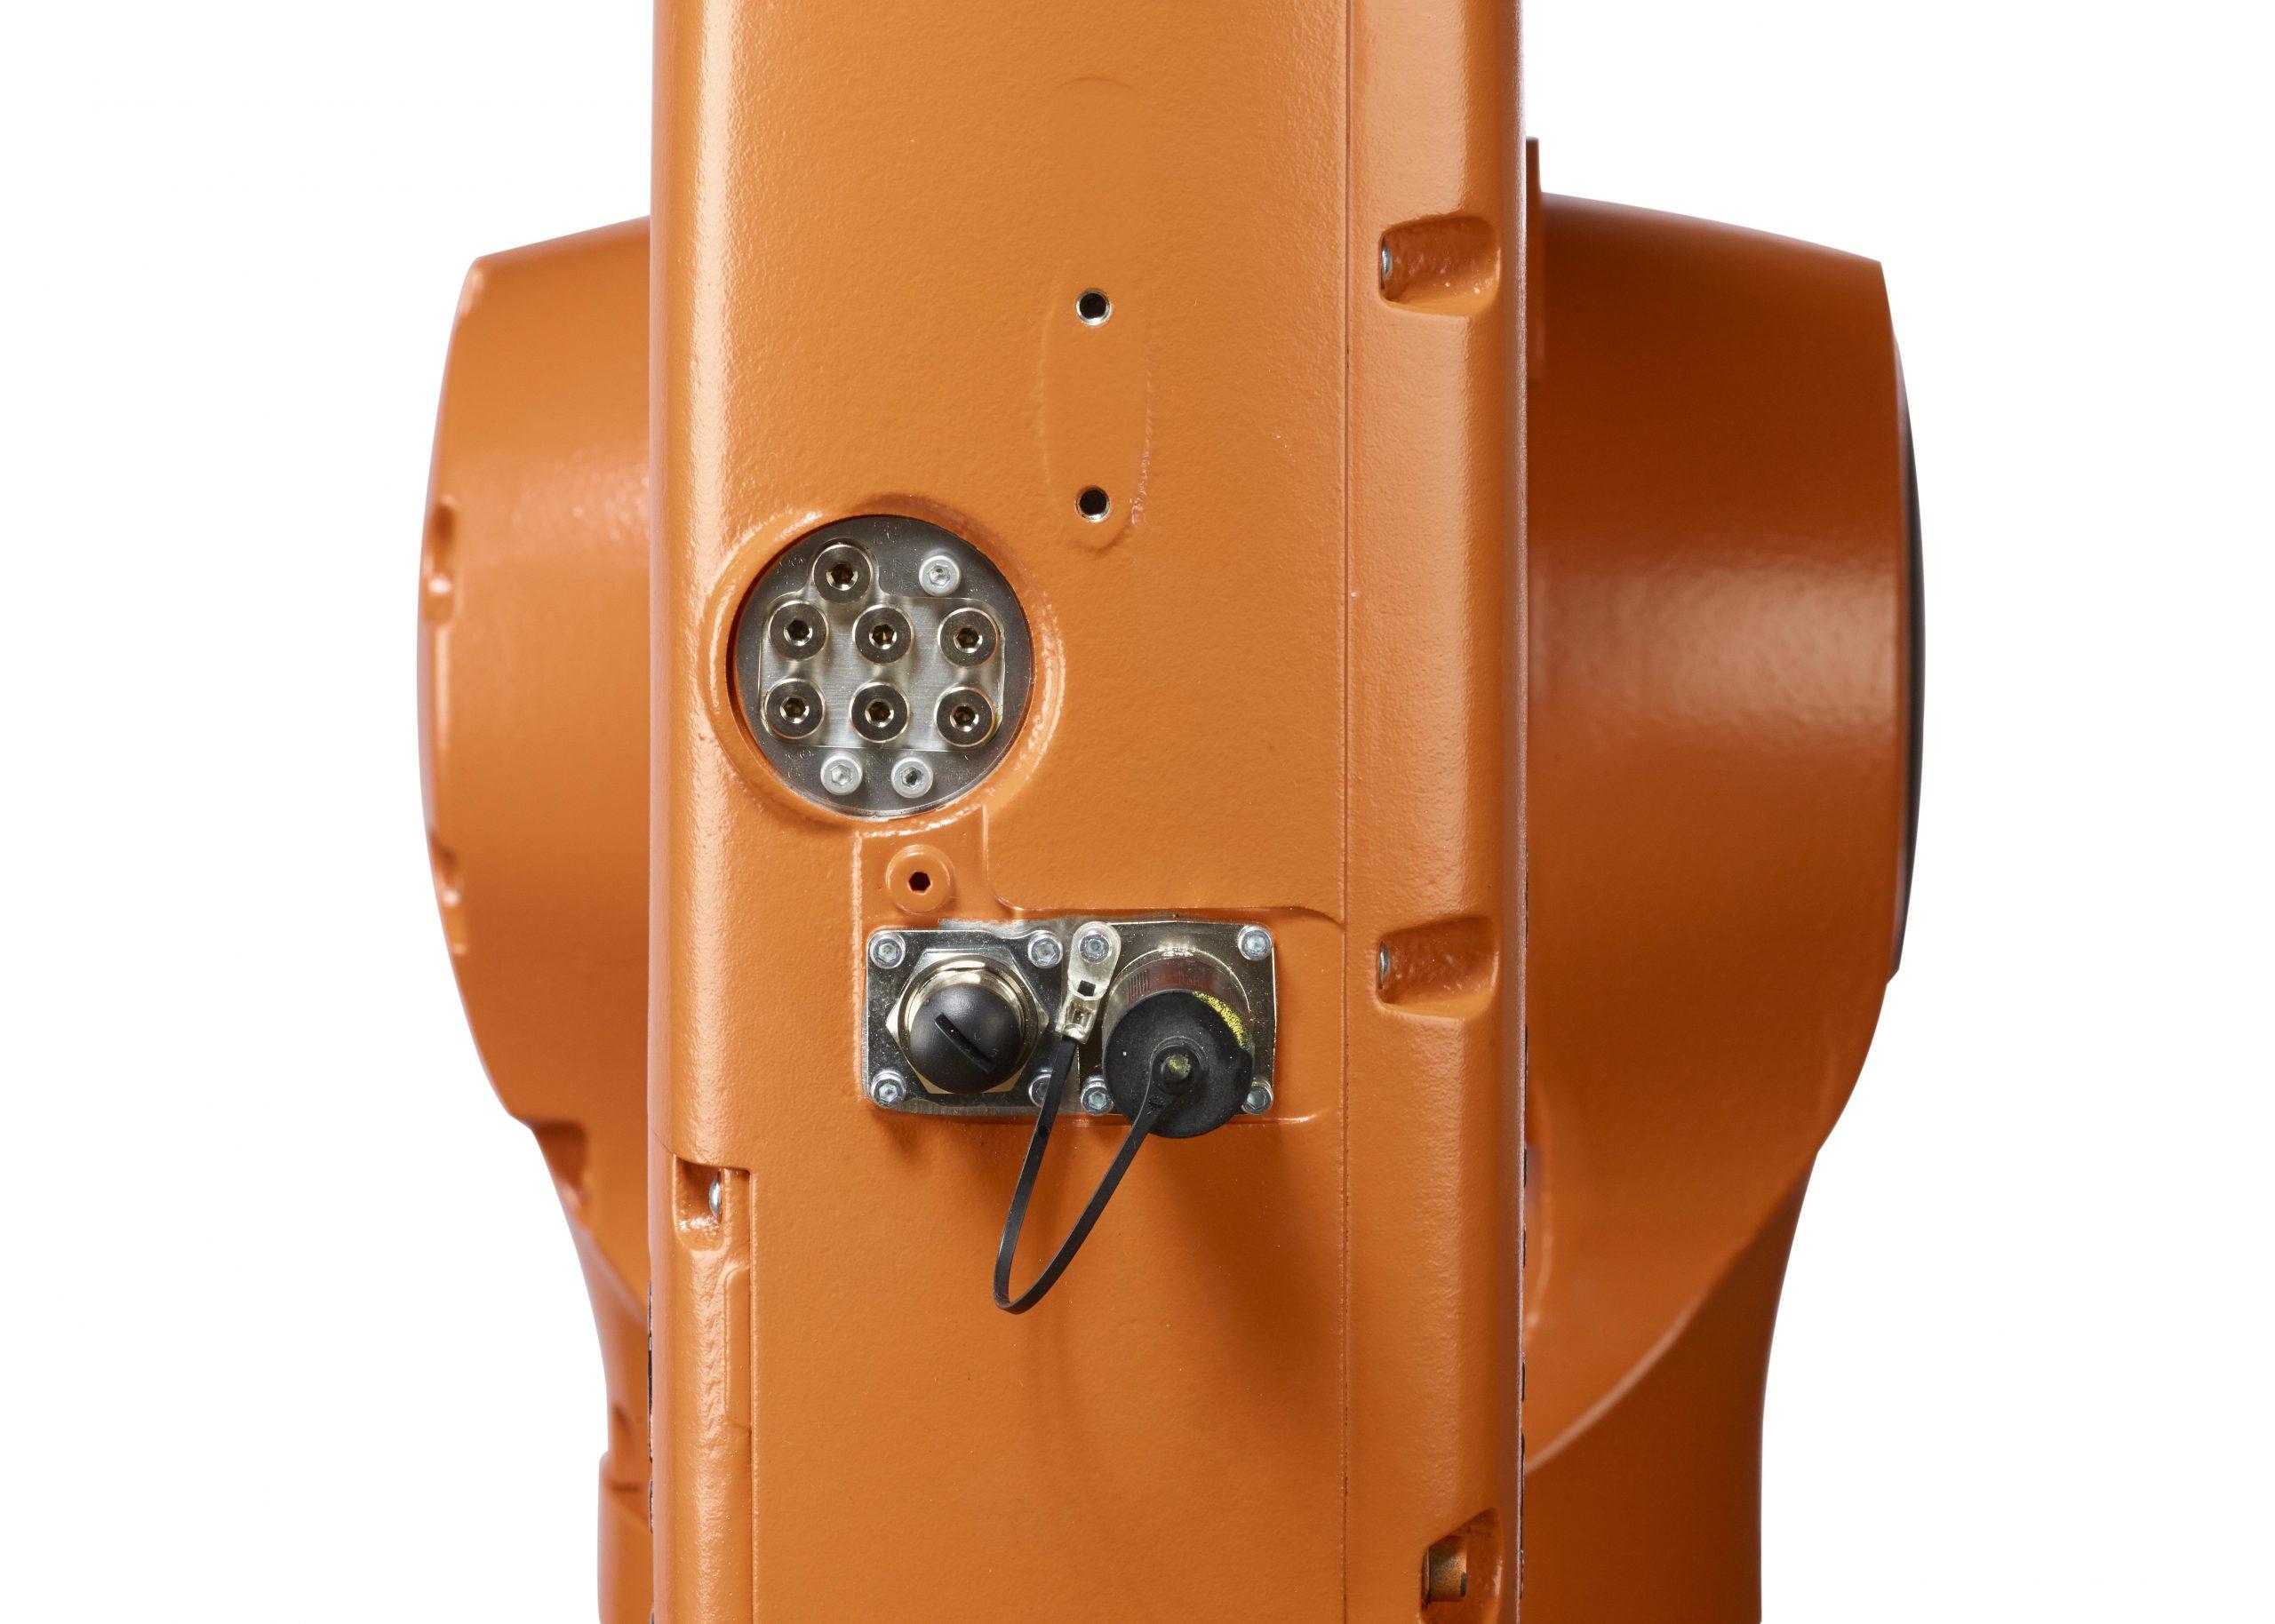 KUKA KR 6 R900 sixx WP (KR AGILUS)-9